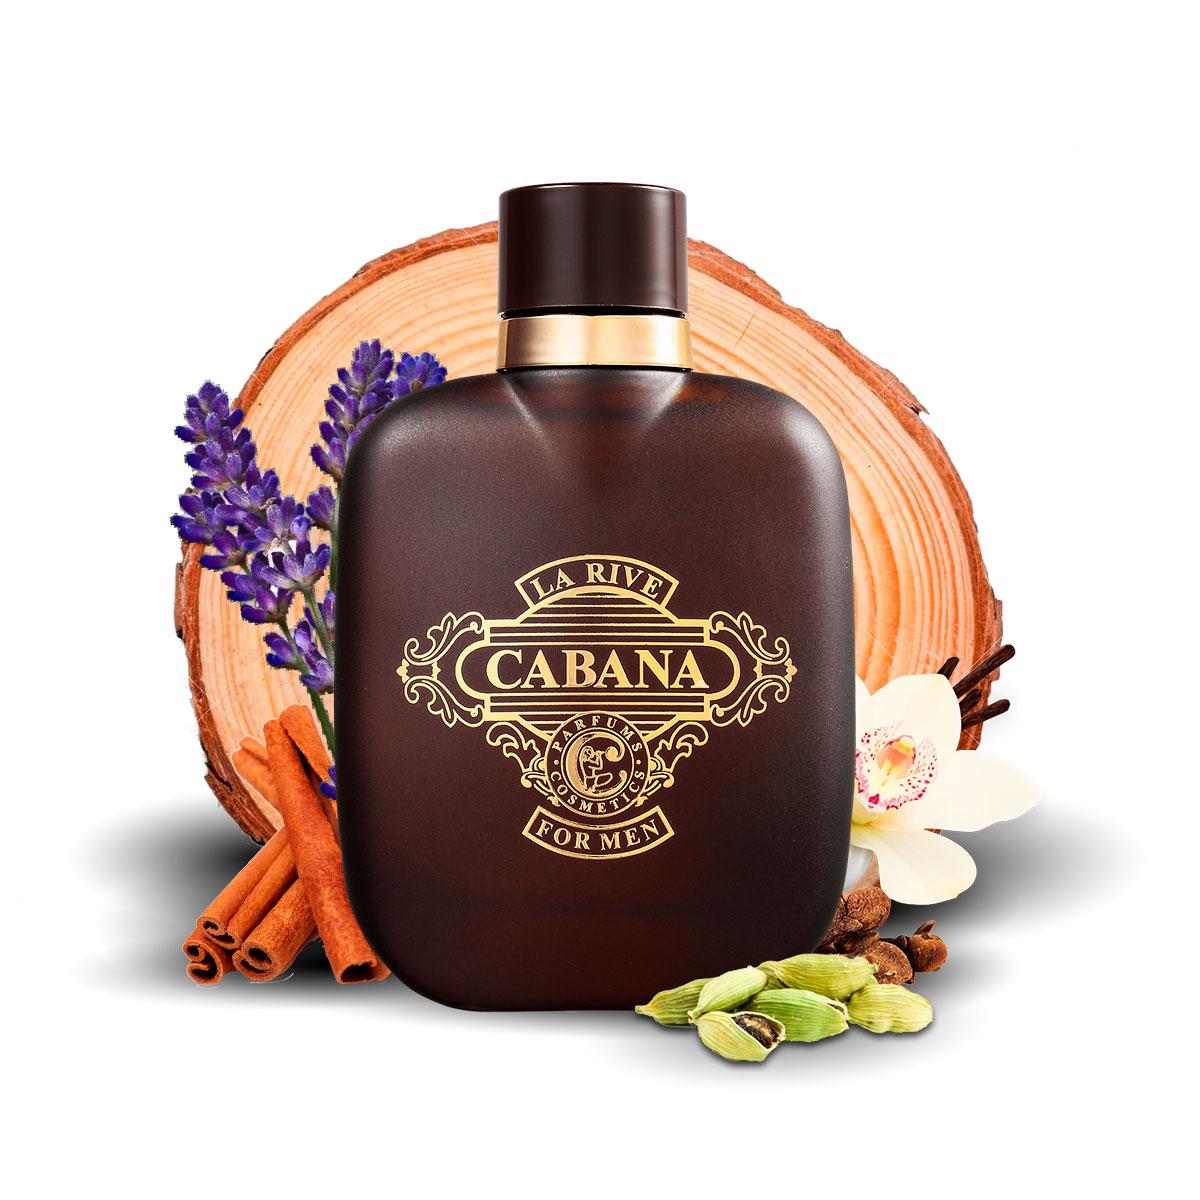 Perfume Cabana Masculino Edp 90ml La Rive